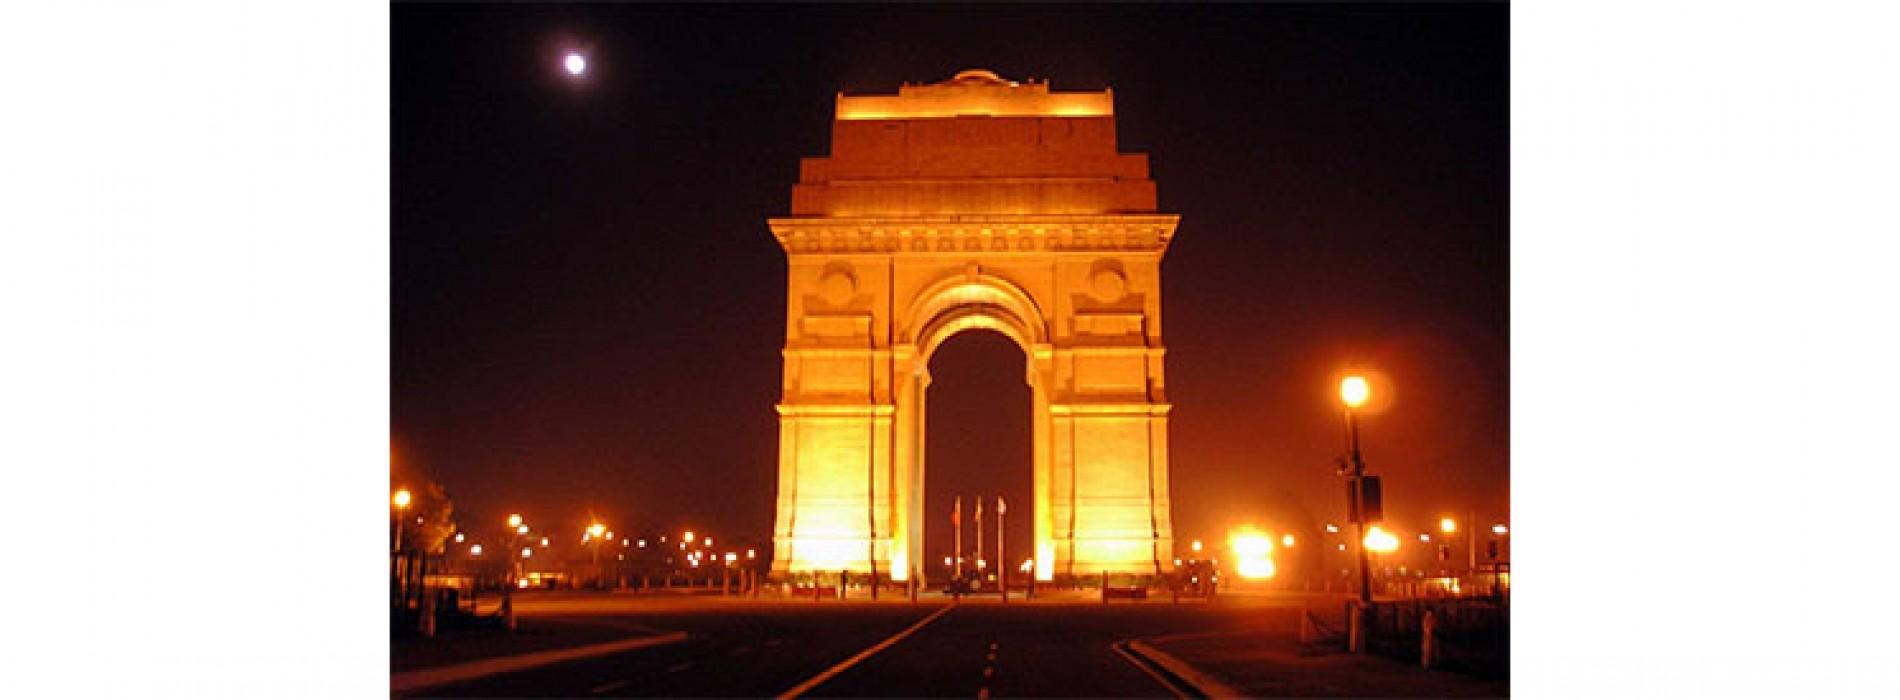 Relive the historic era of India's freedom struggle